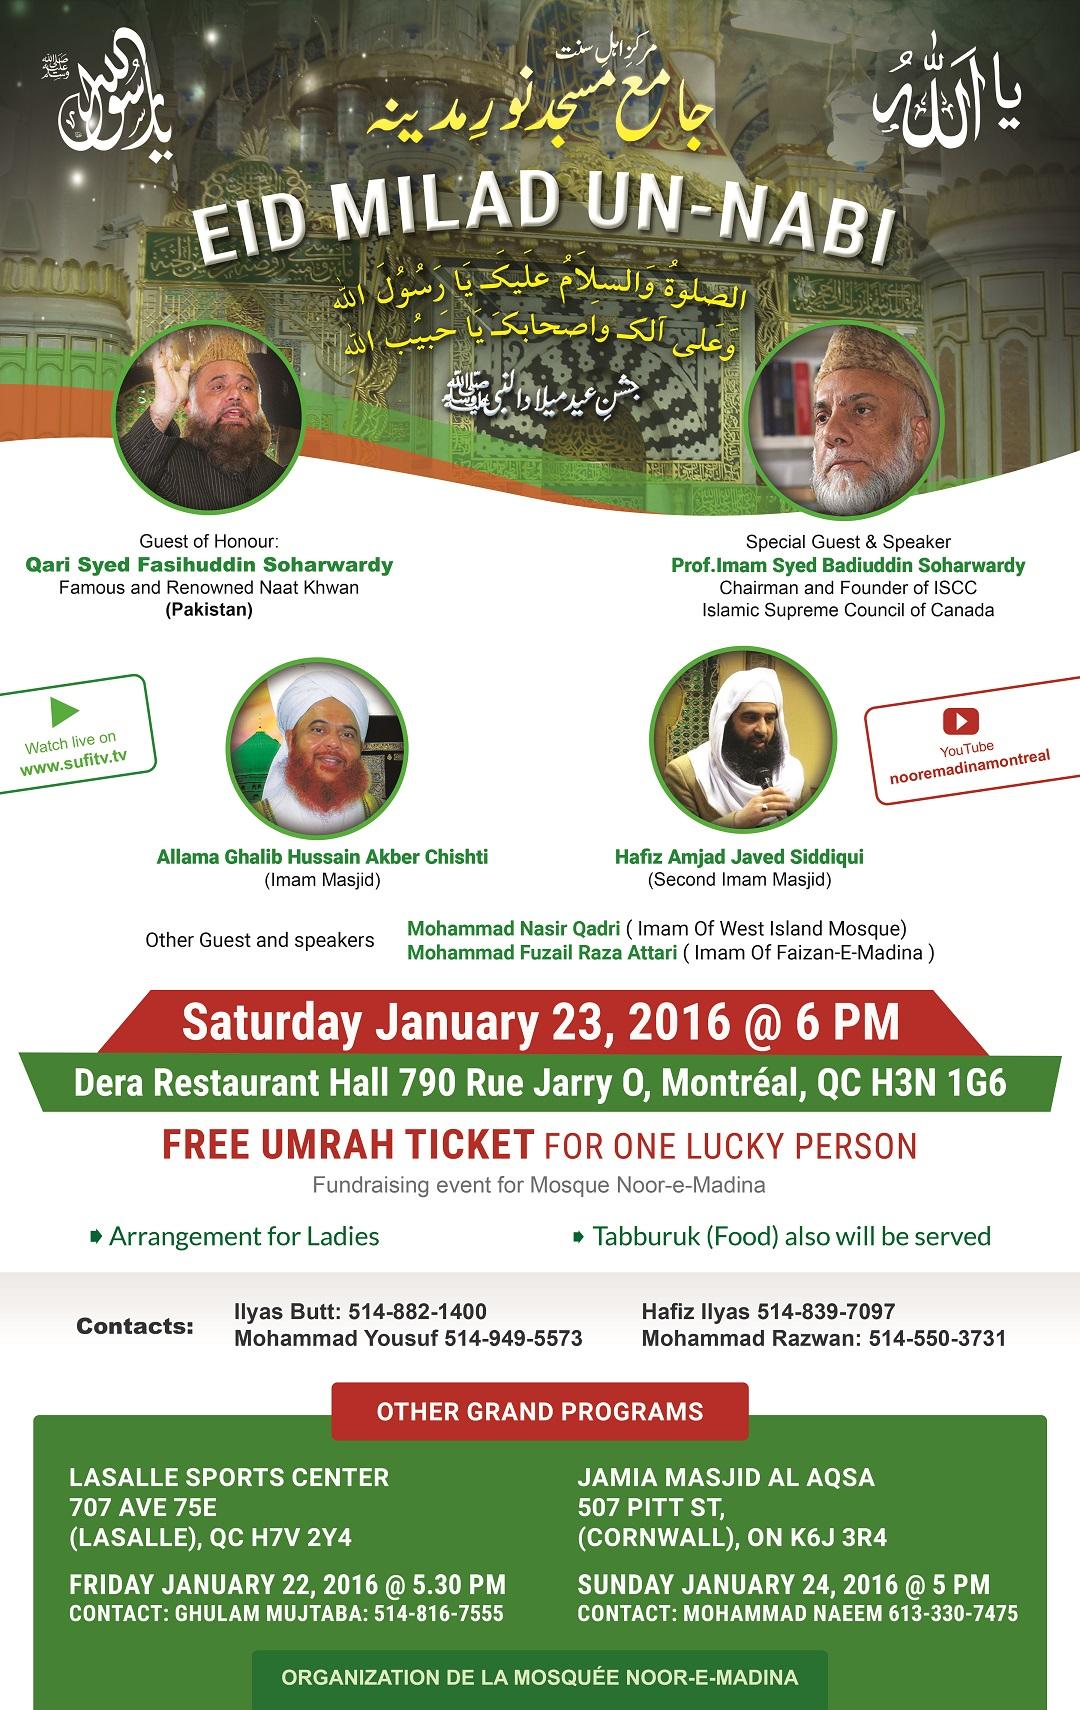 Grand-Eid-Milad-un-Nabi-pbuh-Conference-Montreal-1437